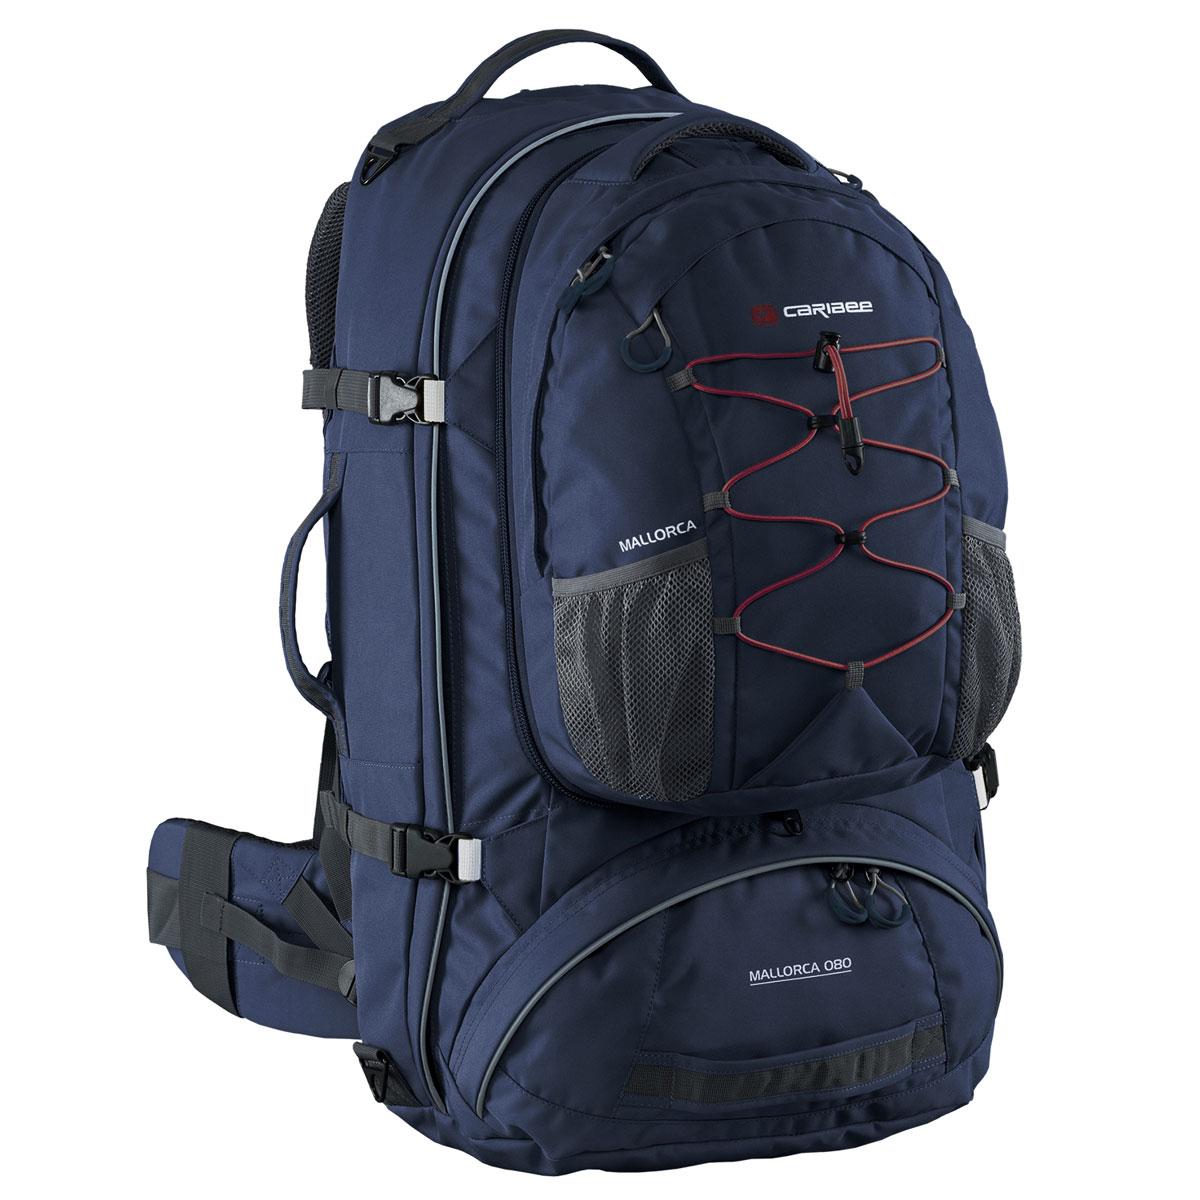 Рюкзак для путешествий Caribee Mallorca, цвет: темно-синий, 70 л рюкзак caribee trek цвет черный 32 л